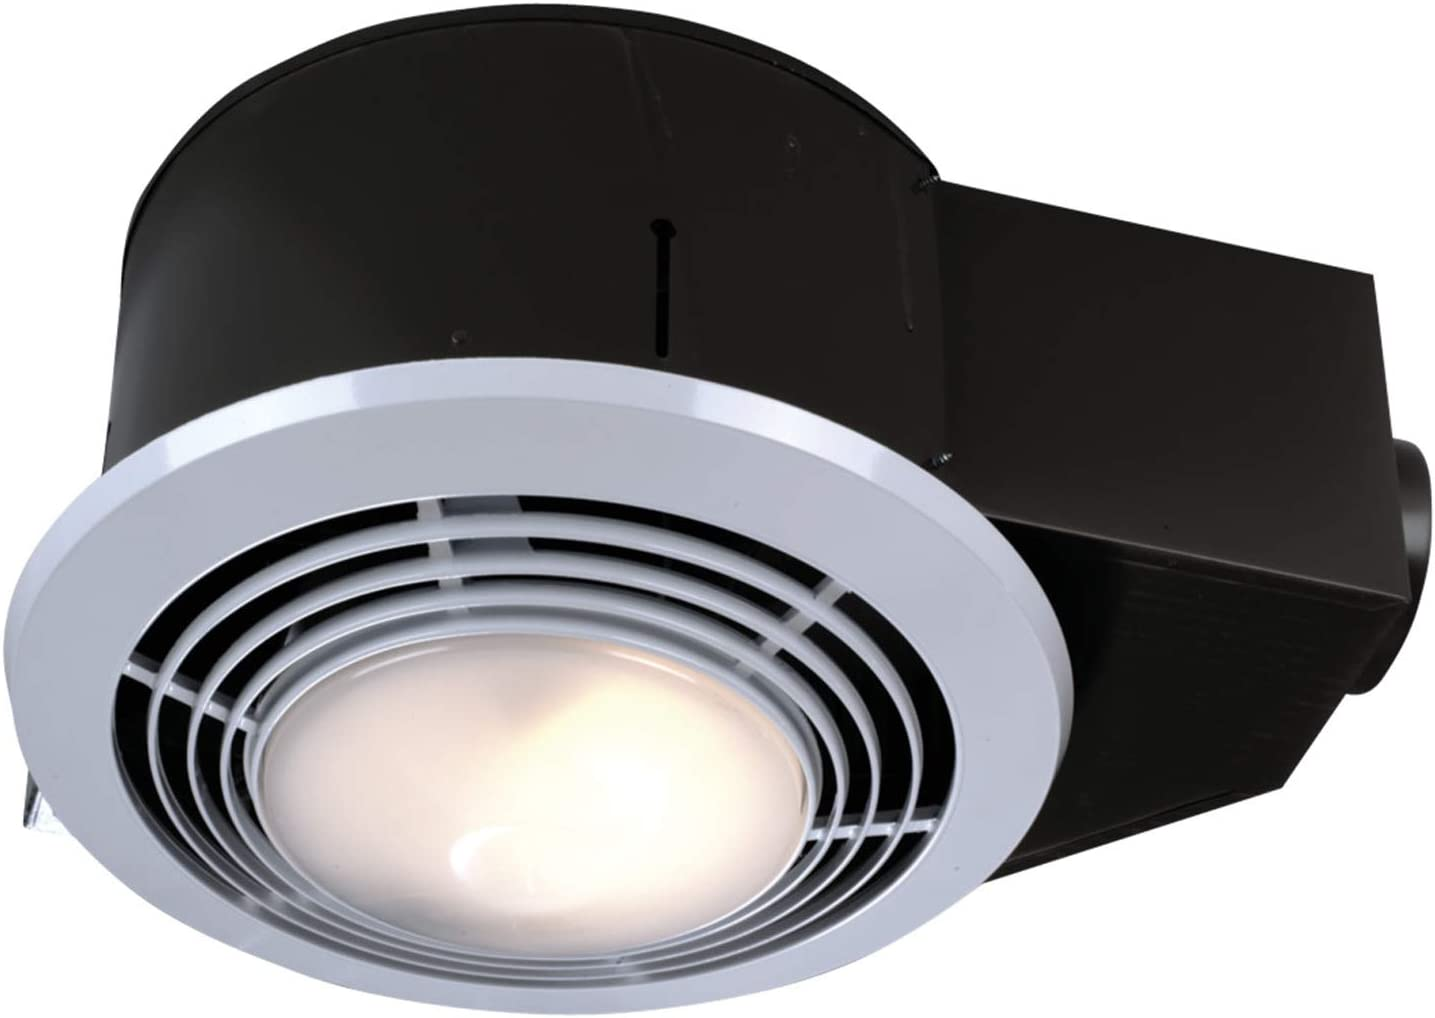 Broan Nutone Qt9093wh Heater Fan And Light Combo For Bathroom And Home 4 0 Sones 1500 Watt Heater And 100 Watt Light 110 Cfm Bathroom Fans Amazon Com